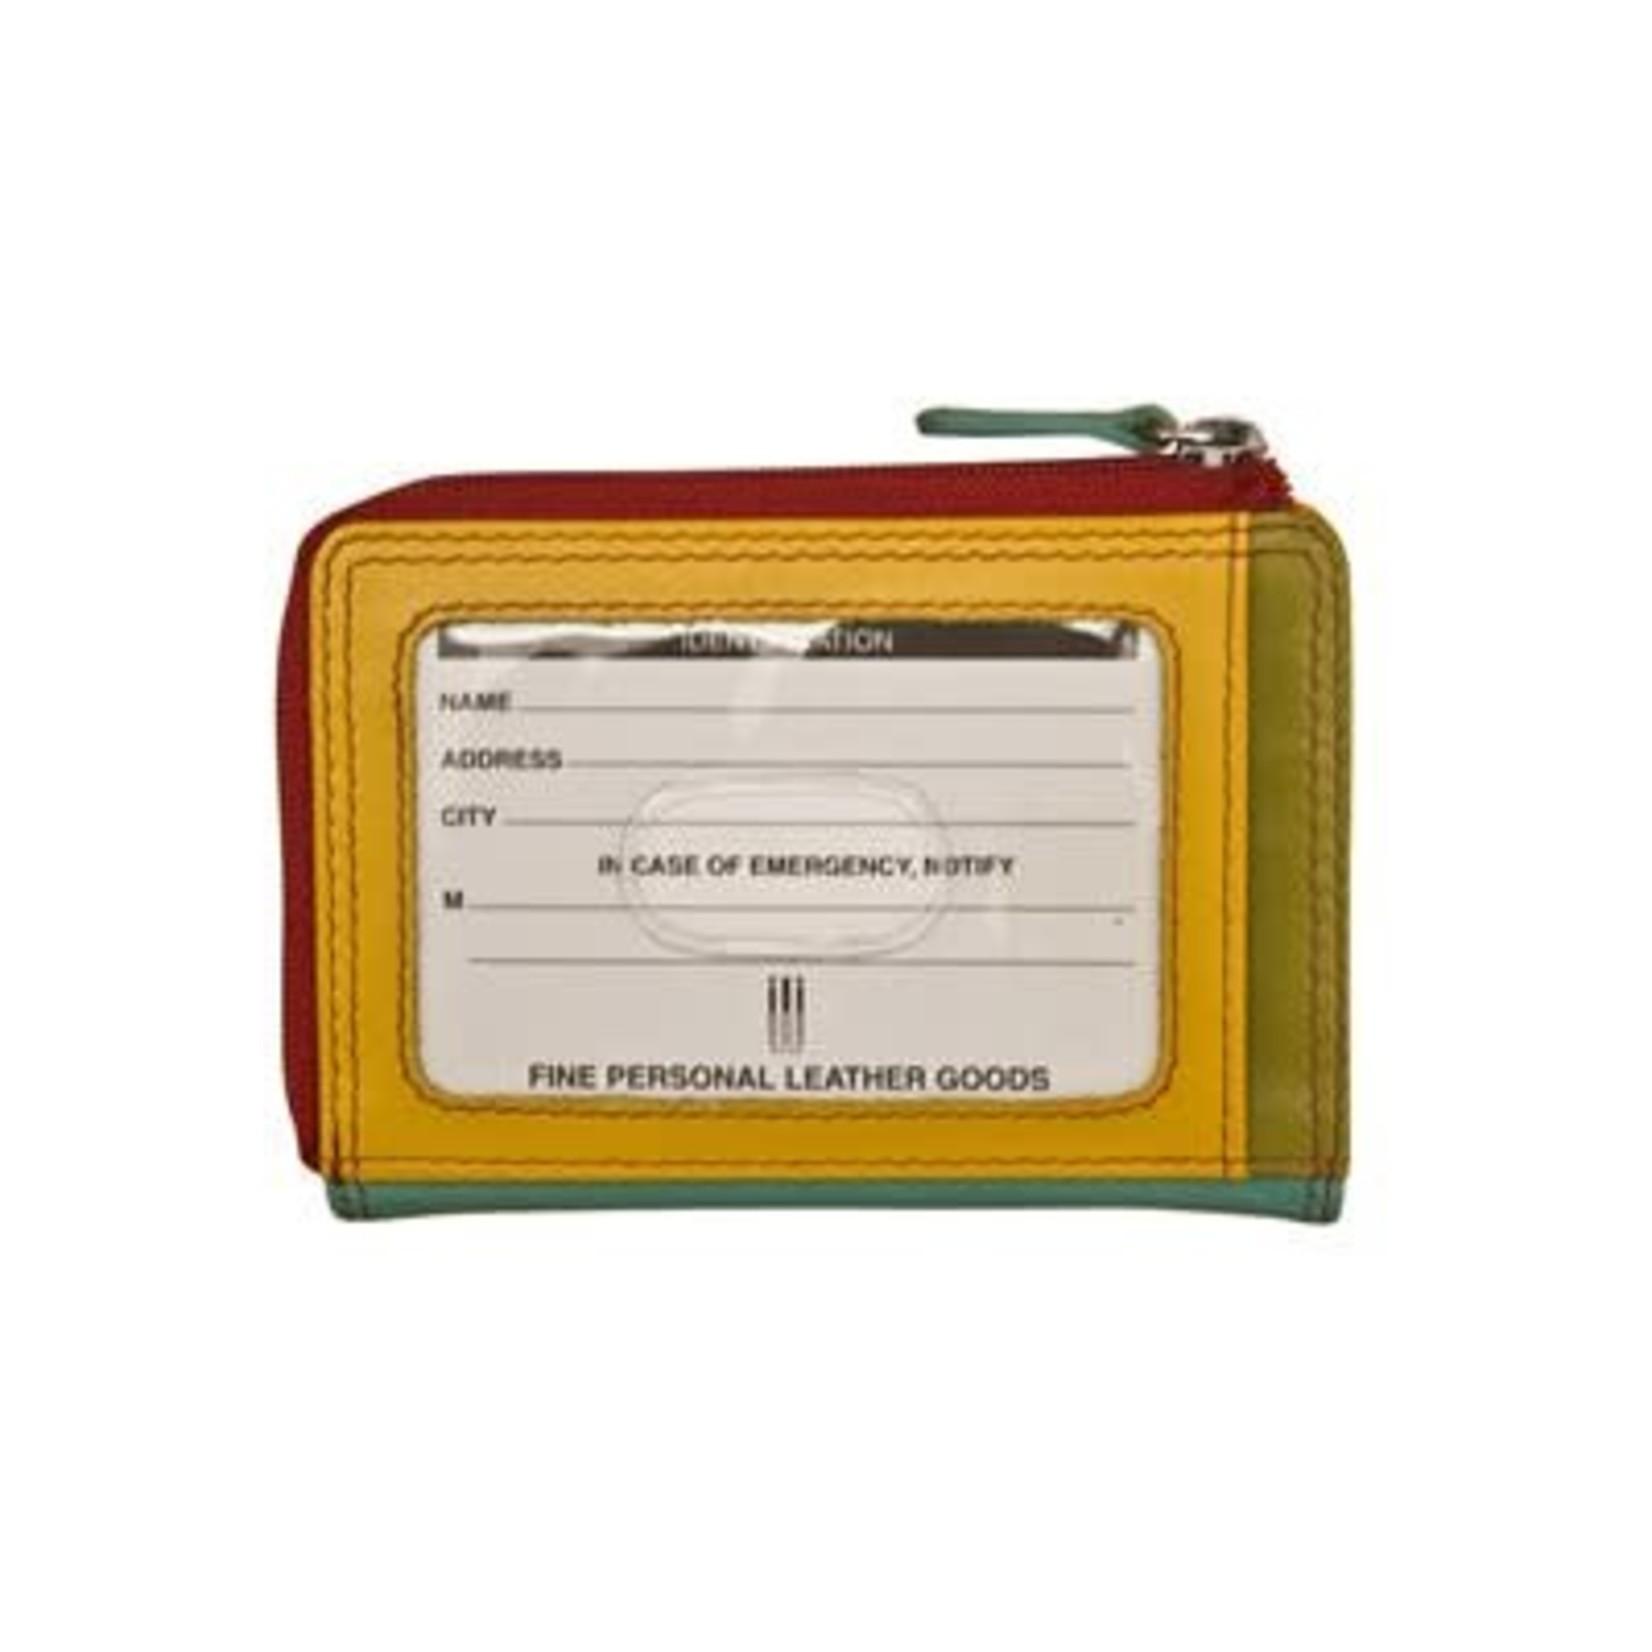 Leather Handbags and Accessories 7411 Citrus - RFID CC ID Holder